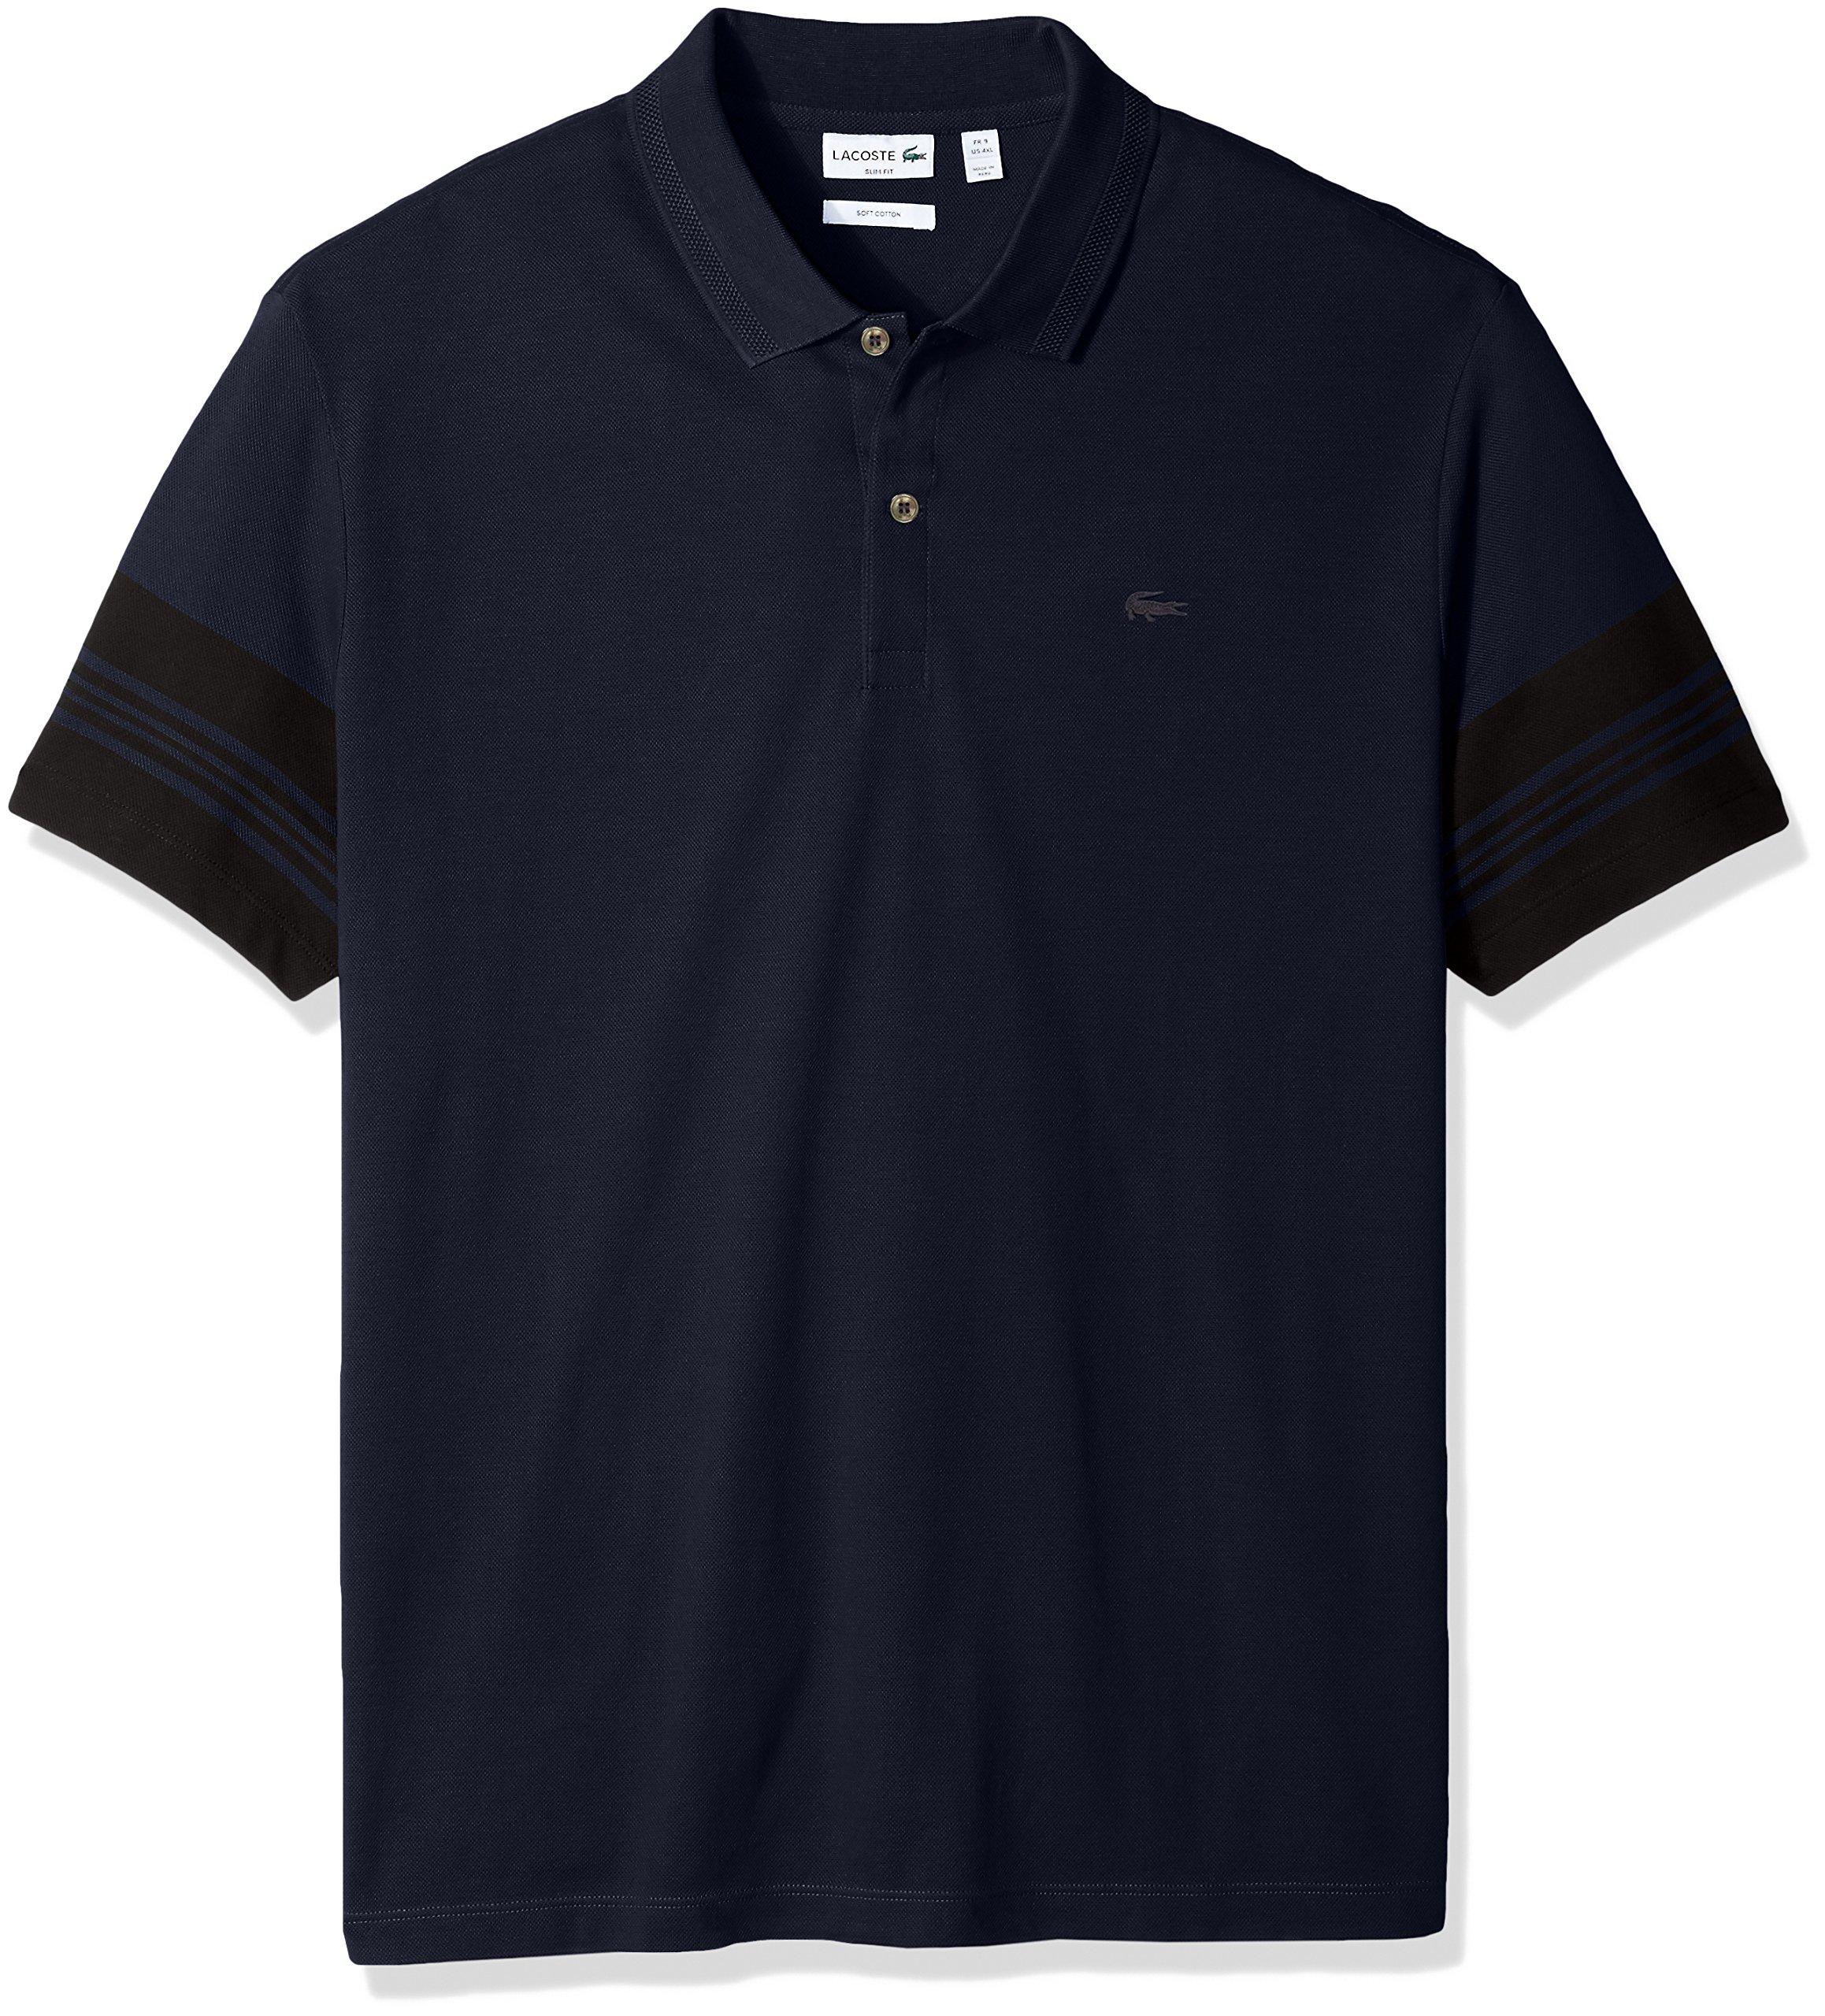 Lacoste Men's Short Subtle Stripe Sleeve Slim Fit Polo, PH2037, Navy Blue/Black, 7